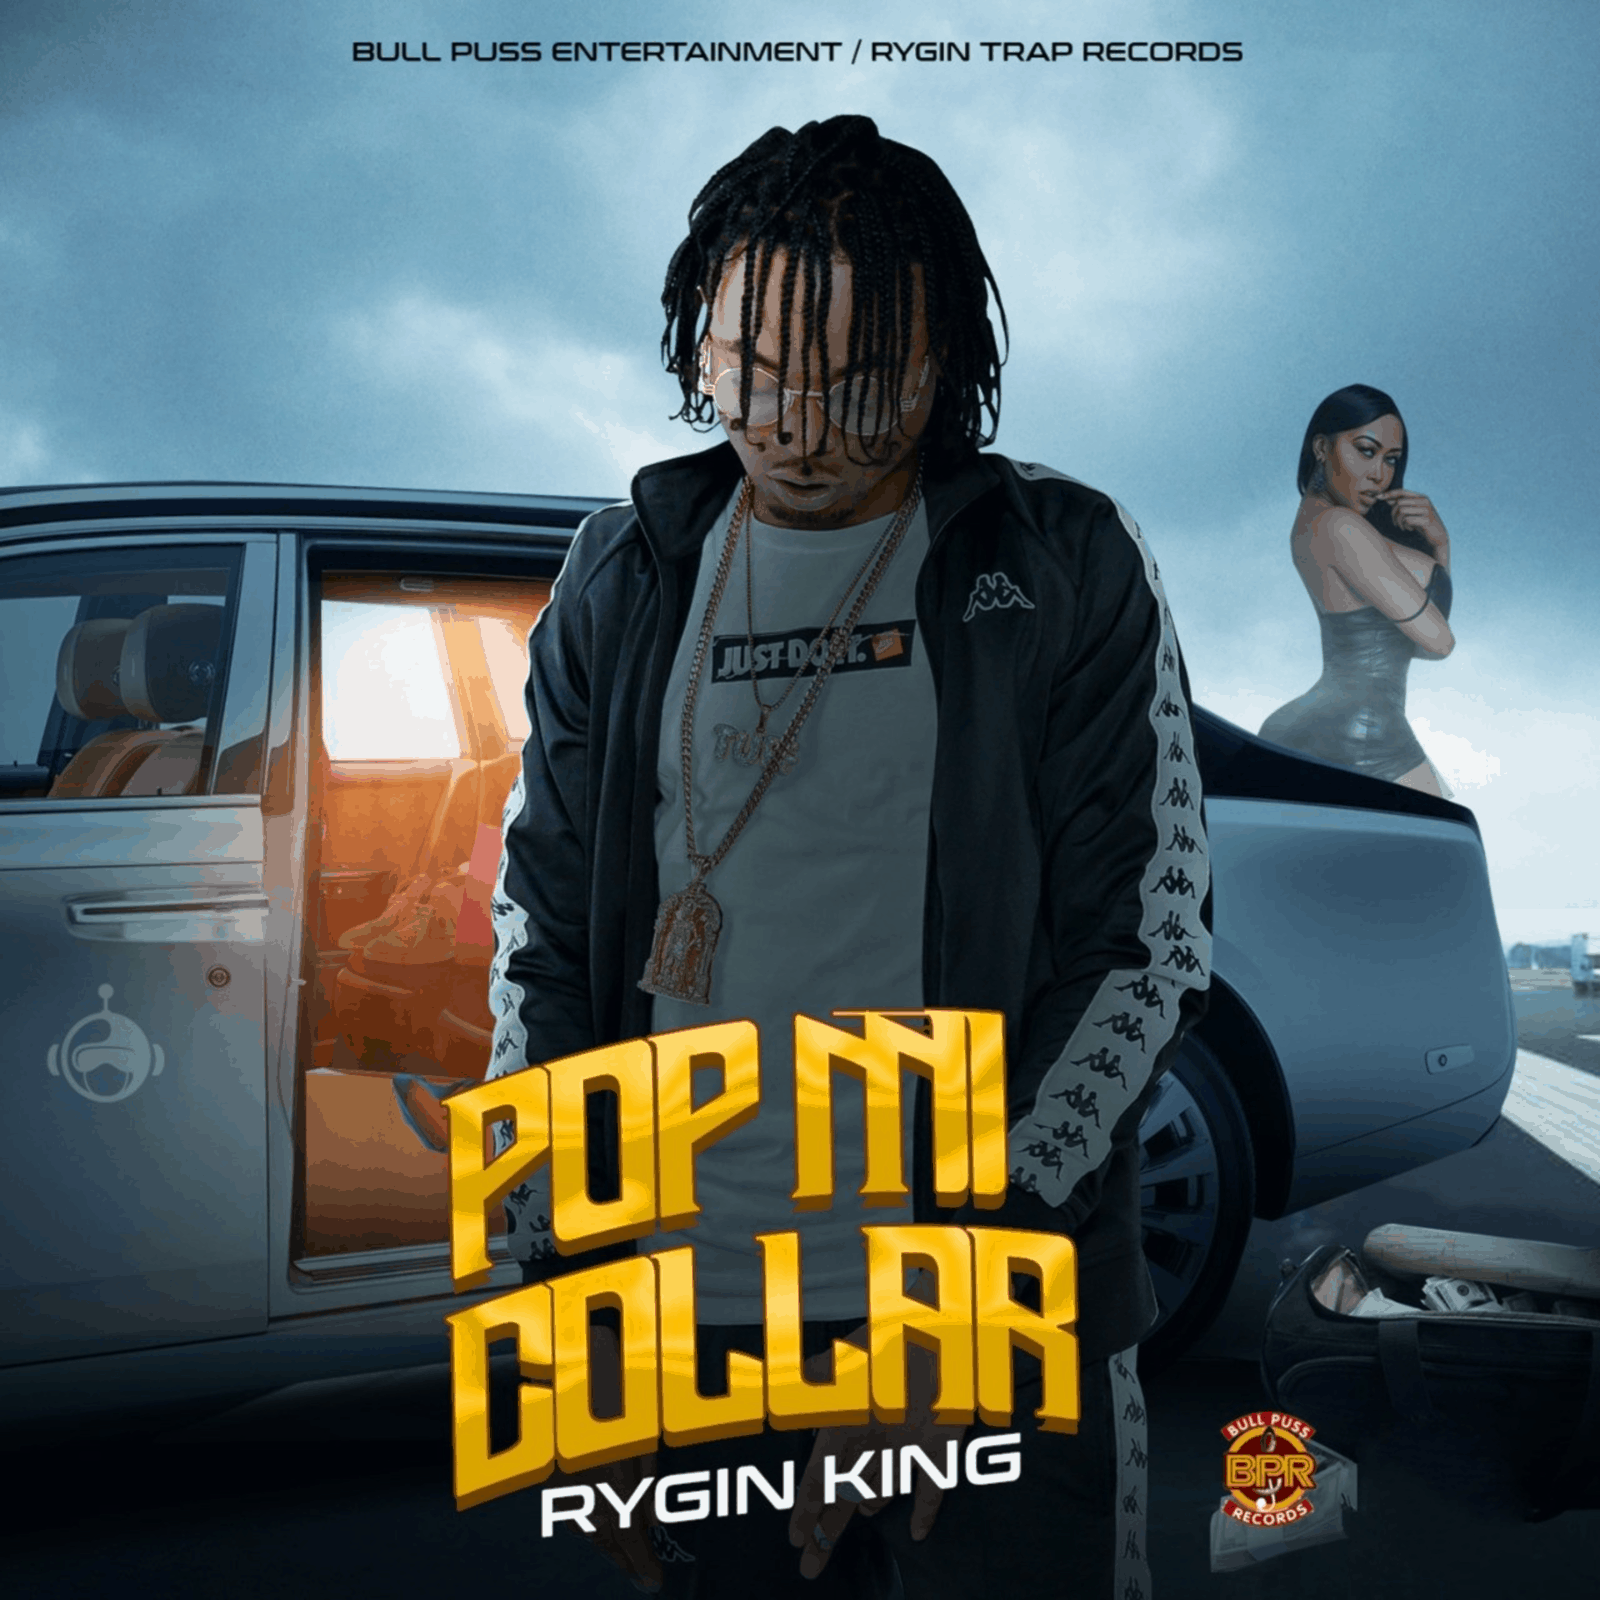 Ryging King - Pop Mi Collar - Rygin Trap Records / Bull Puss Entertainment